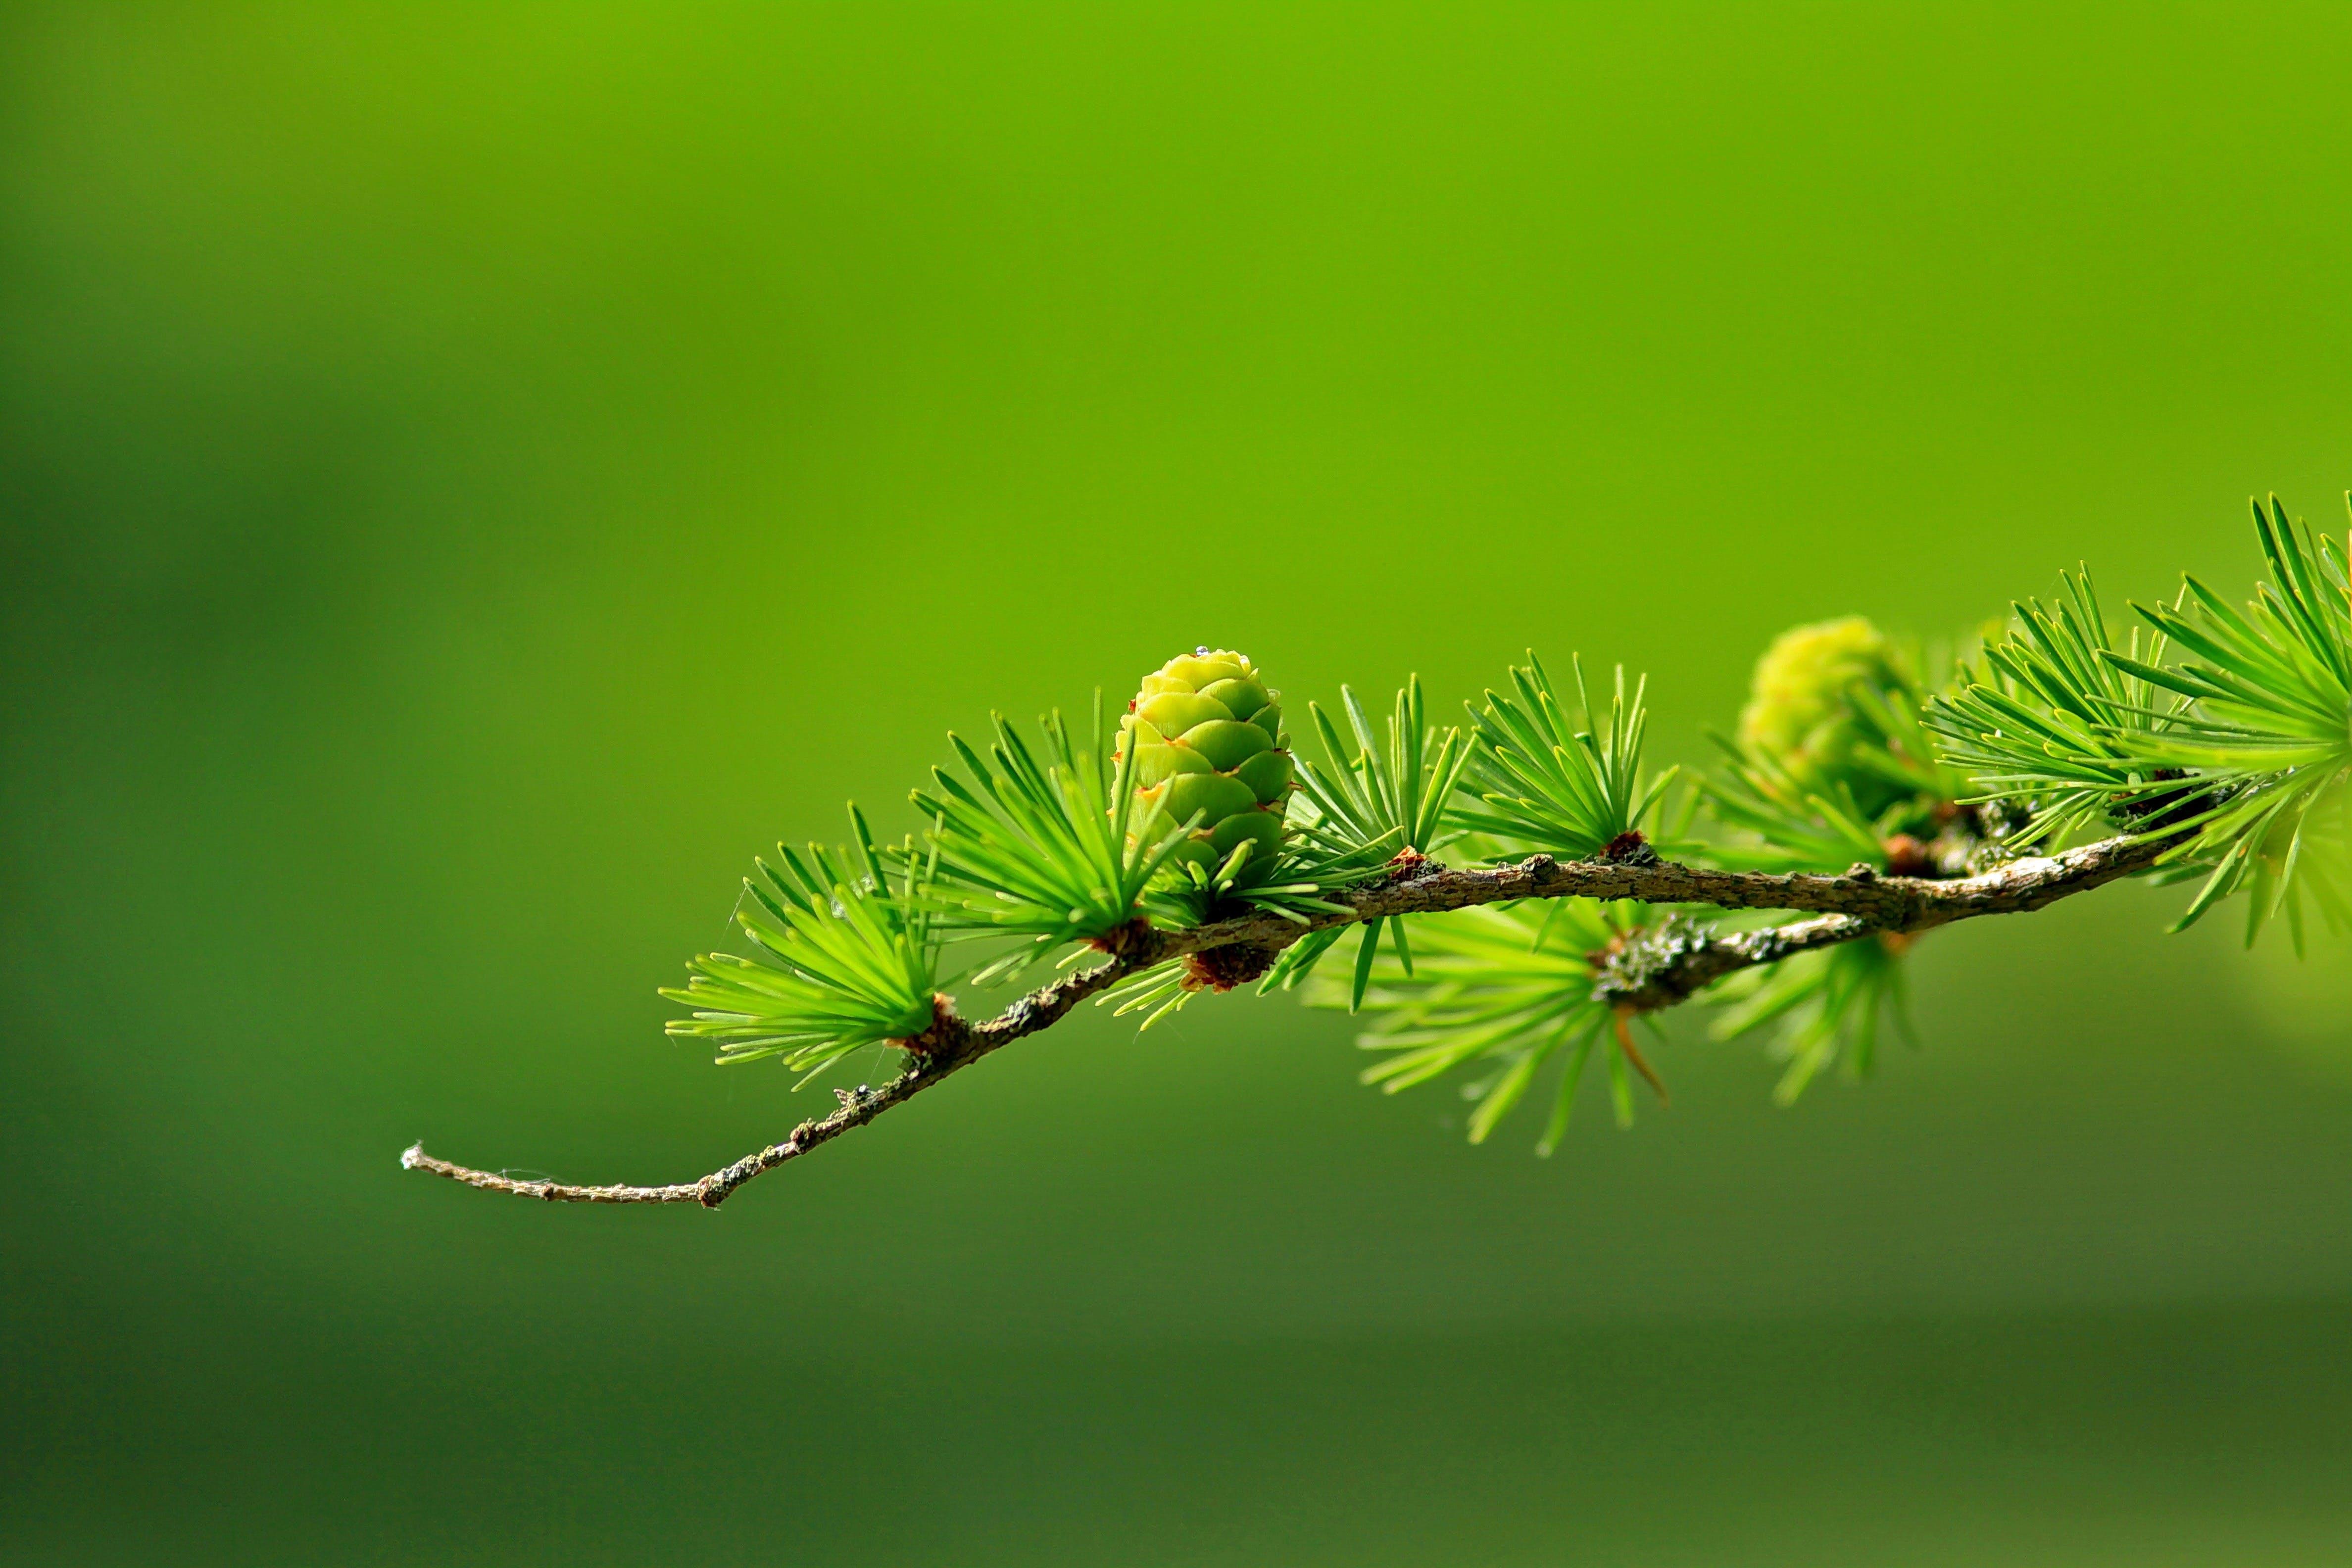 Green Tree Plant Leaves